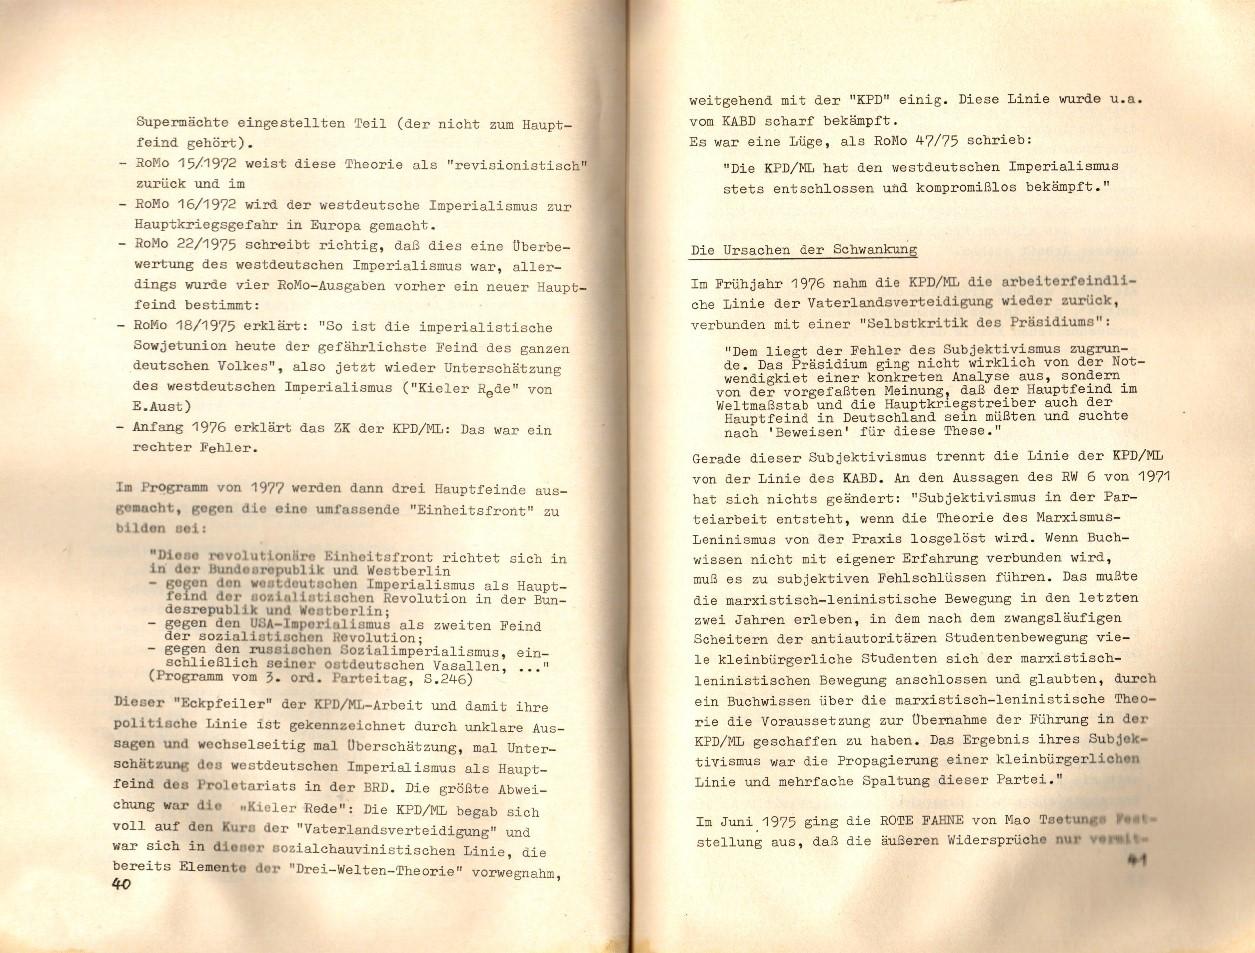 KABD_1978_Argumentationshilfen_22